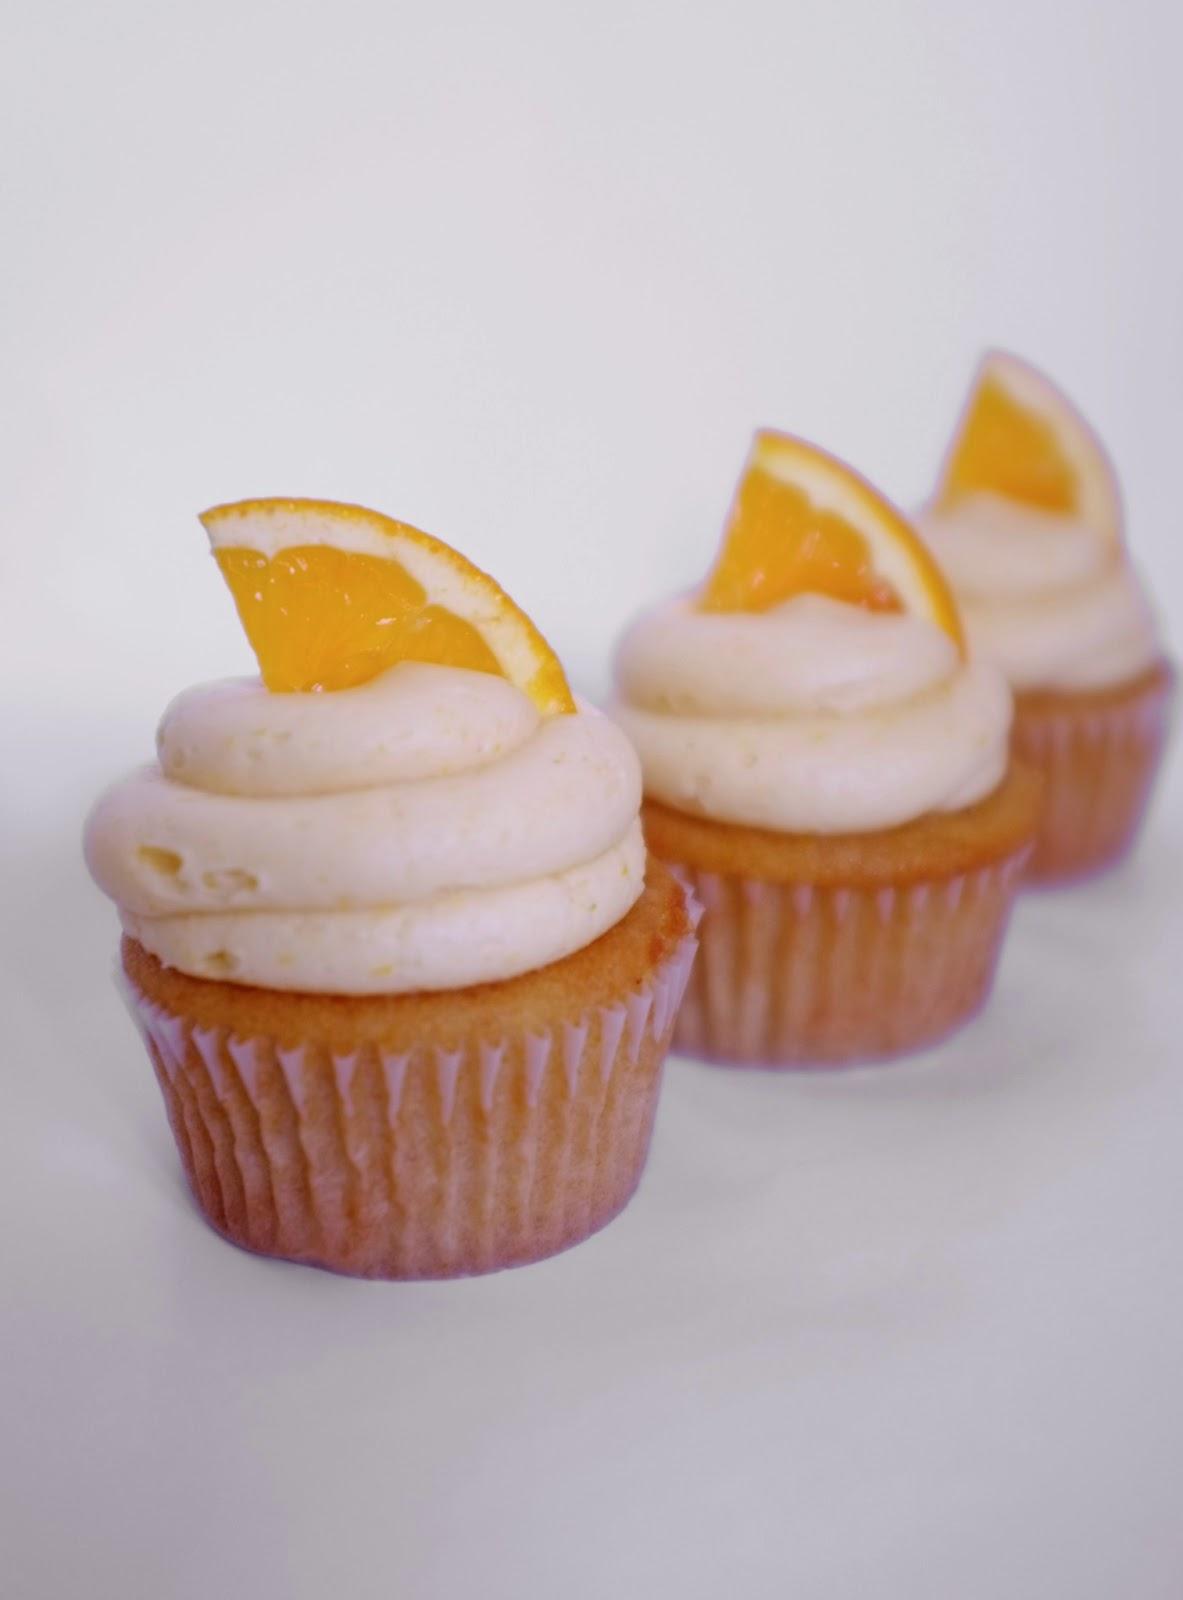 Sweet Elites Vegan Cupcakes: Mimosa in a Cupcake